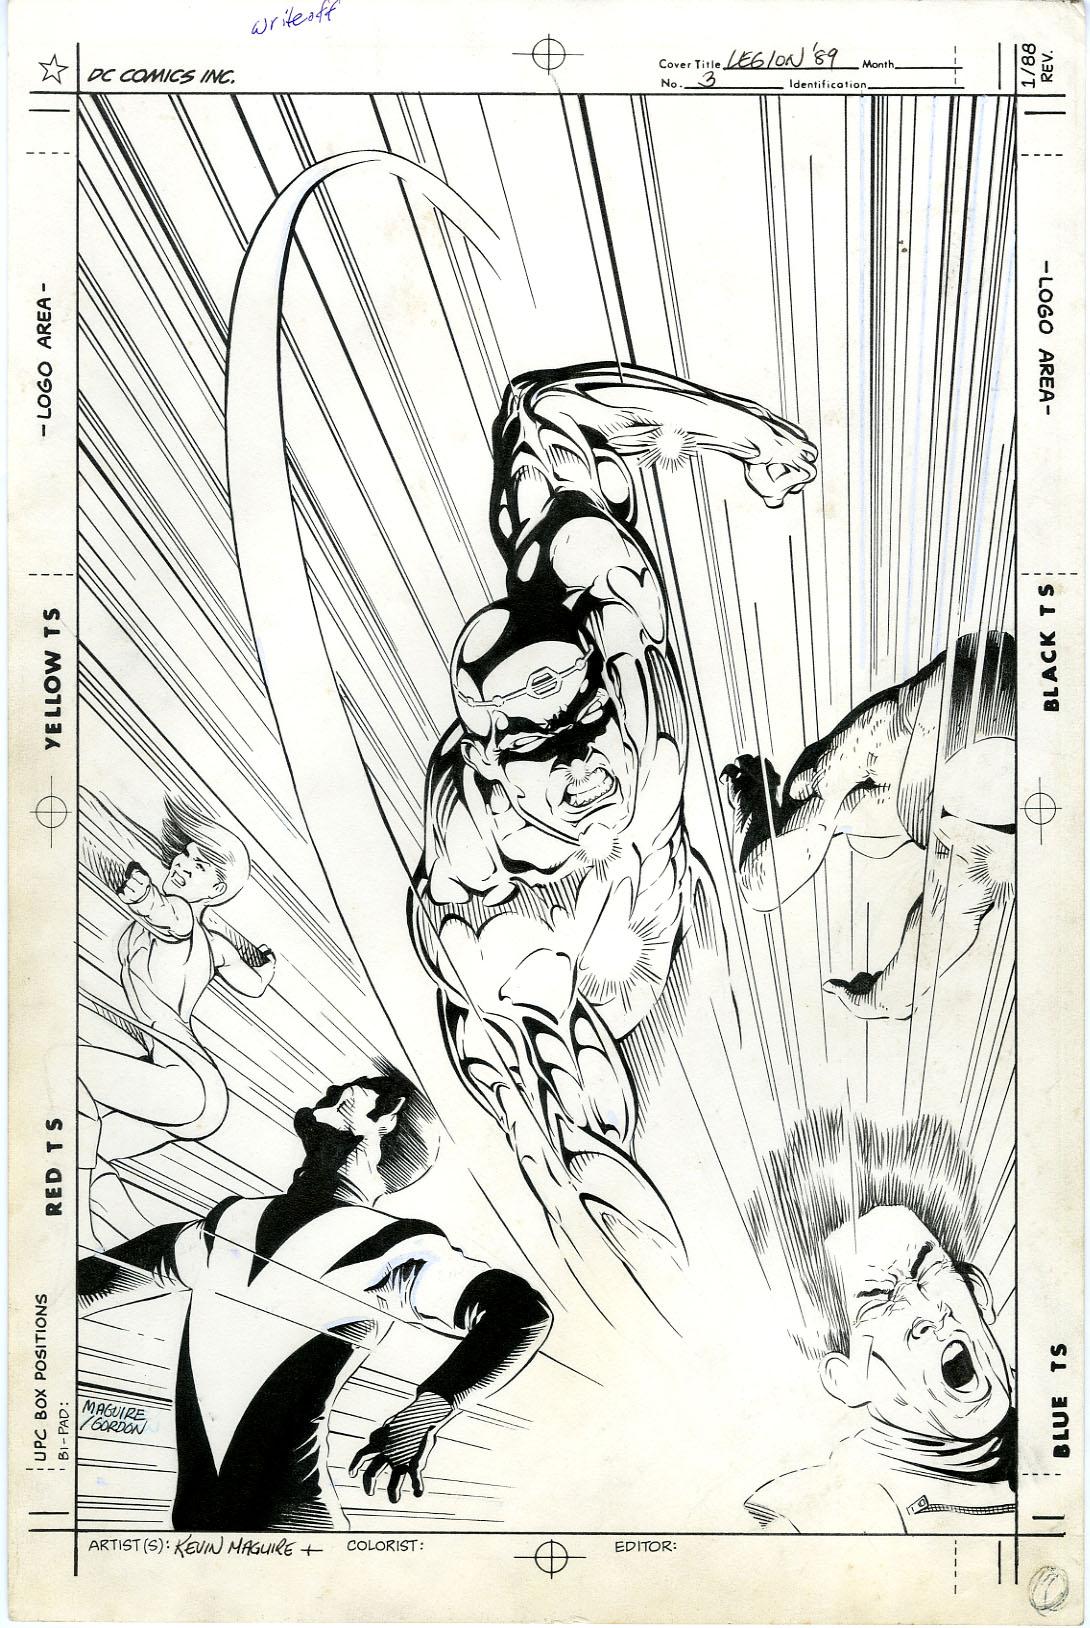 KEVIN MAGUIRE / AL GORDON - UNPUBLISHED L.E.G.I.O.N. '89 #3 COVER ORIGINAL ART